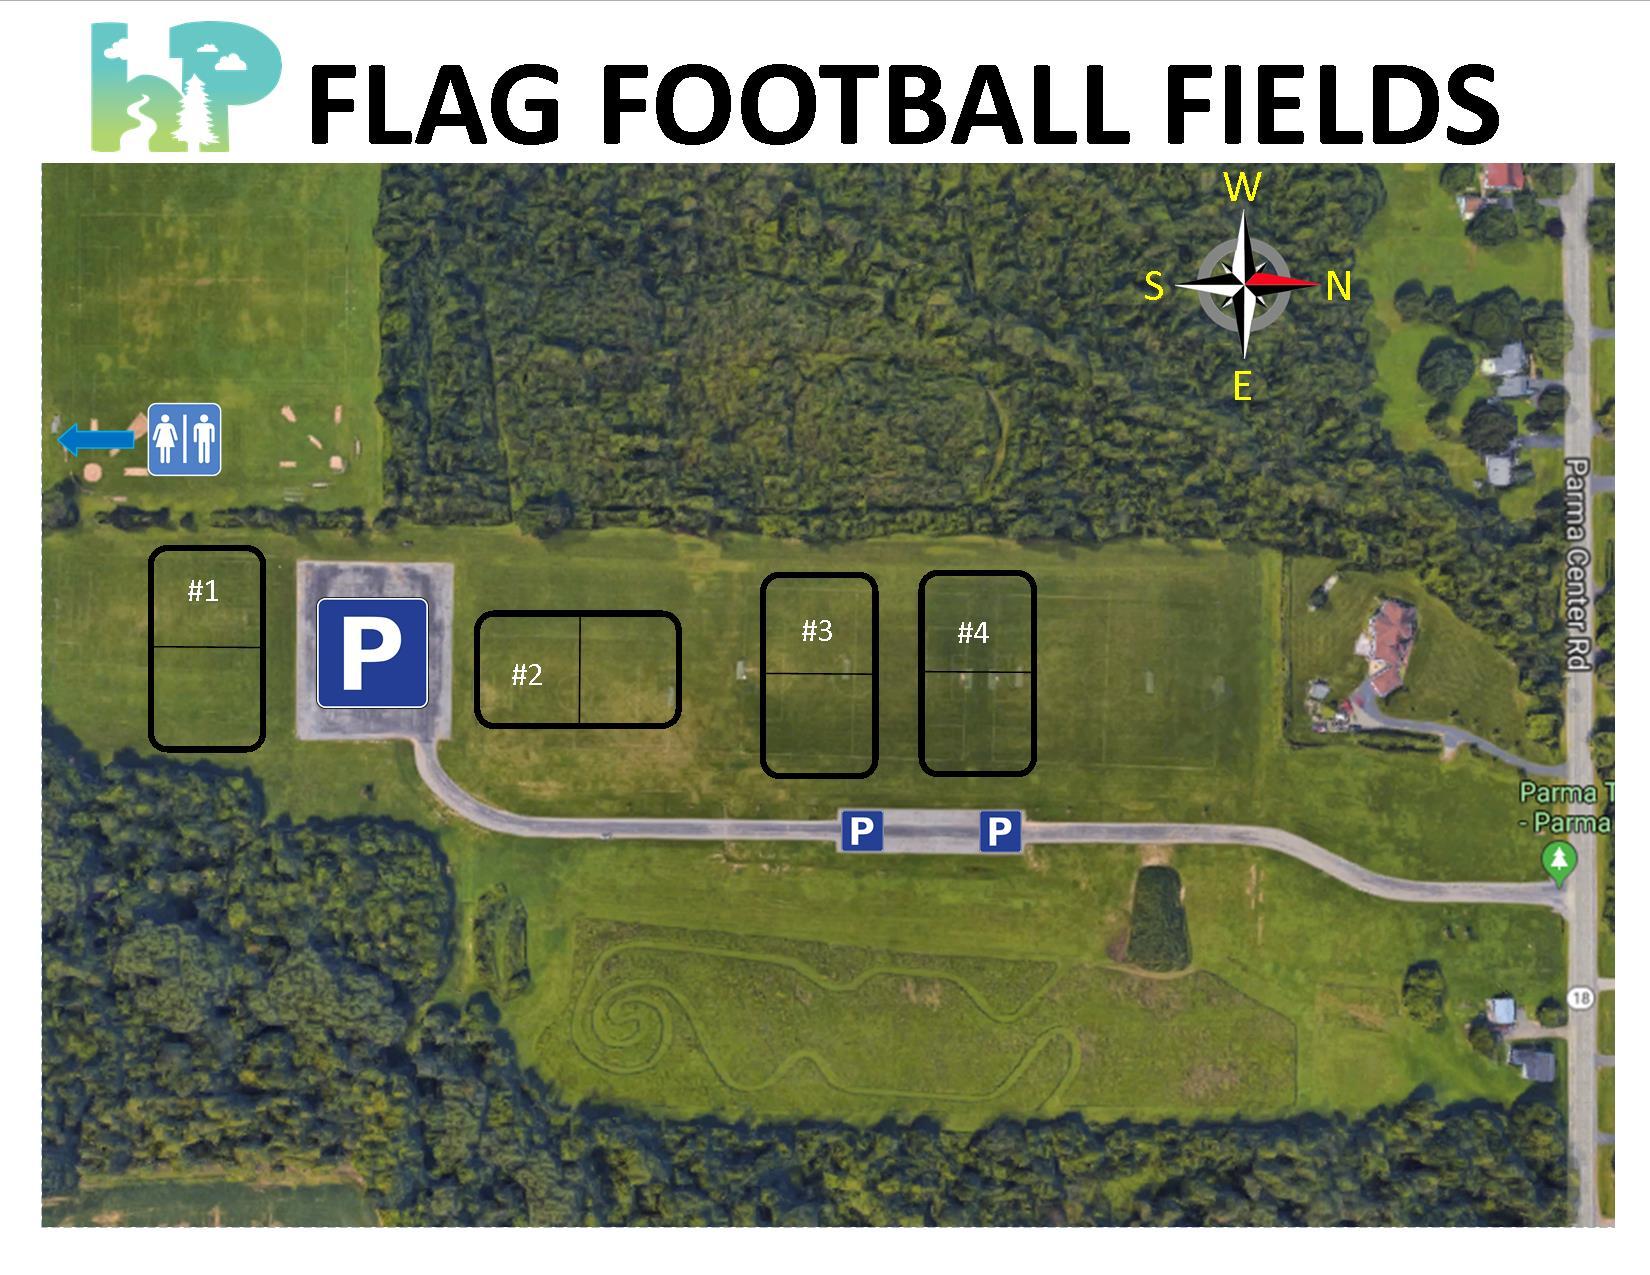 2019 Flag Football Field Map - Official